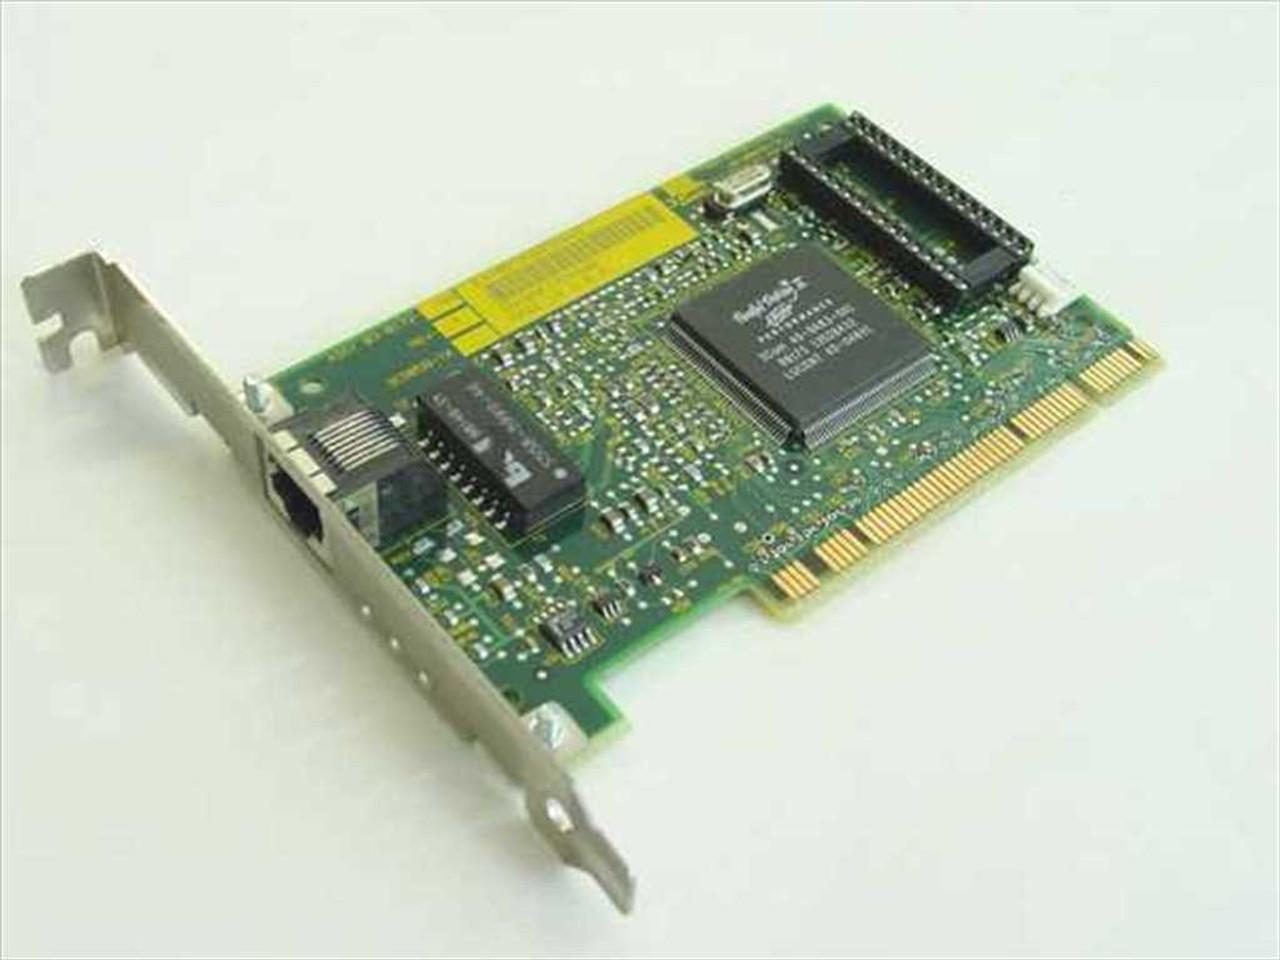 3COM 3C905B-TX XL PCI DRIVERS DOWNLOAD FREE